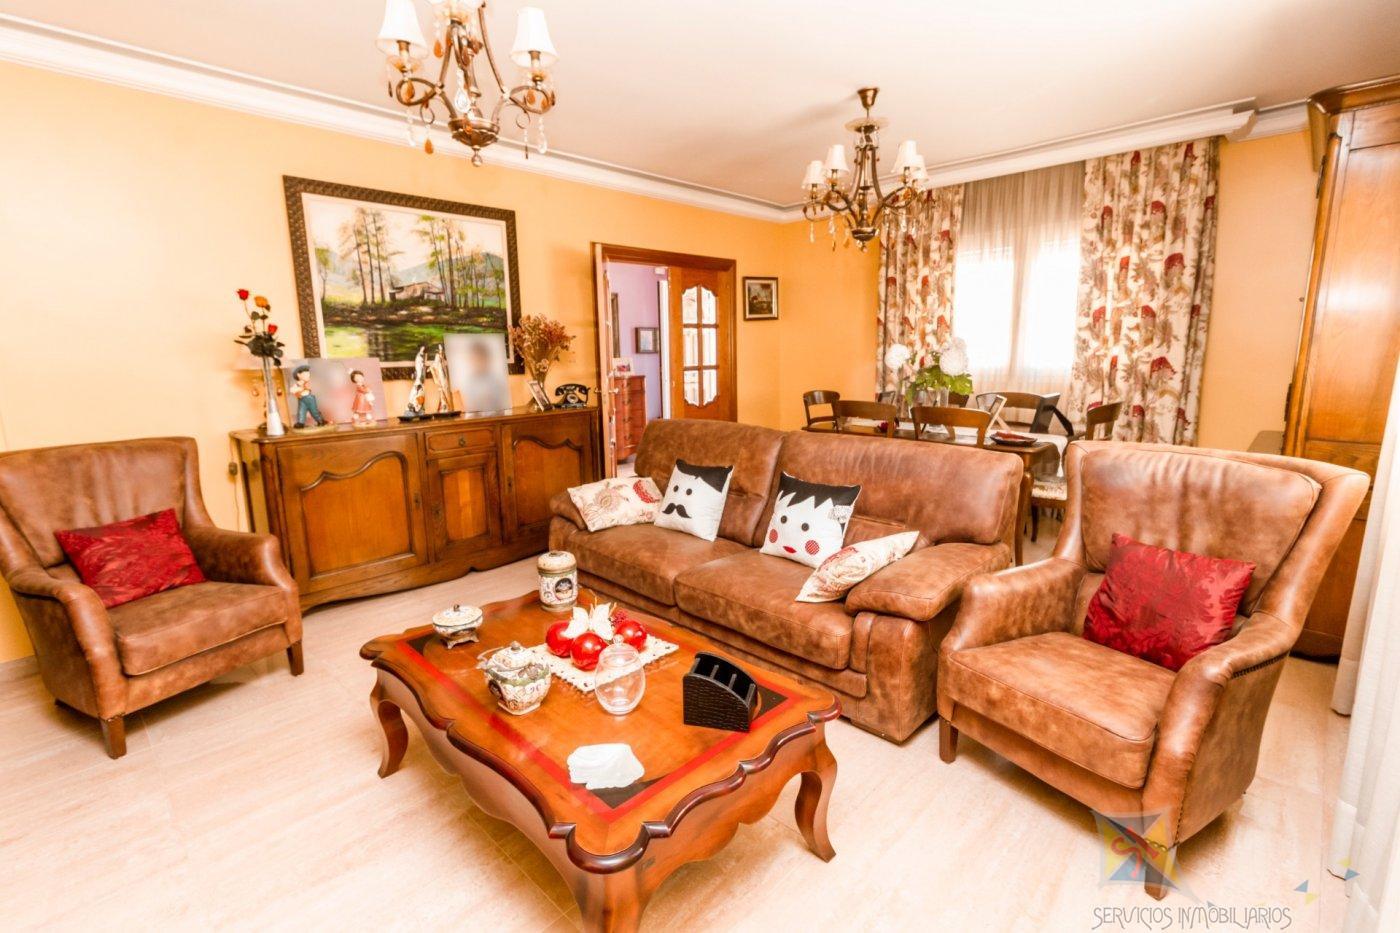 For sale of duplex in El Ejido